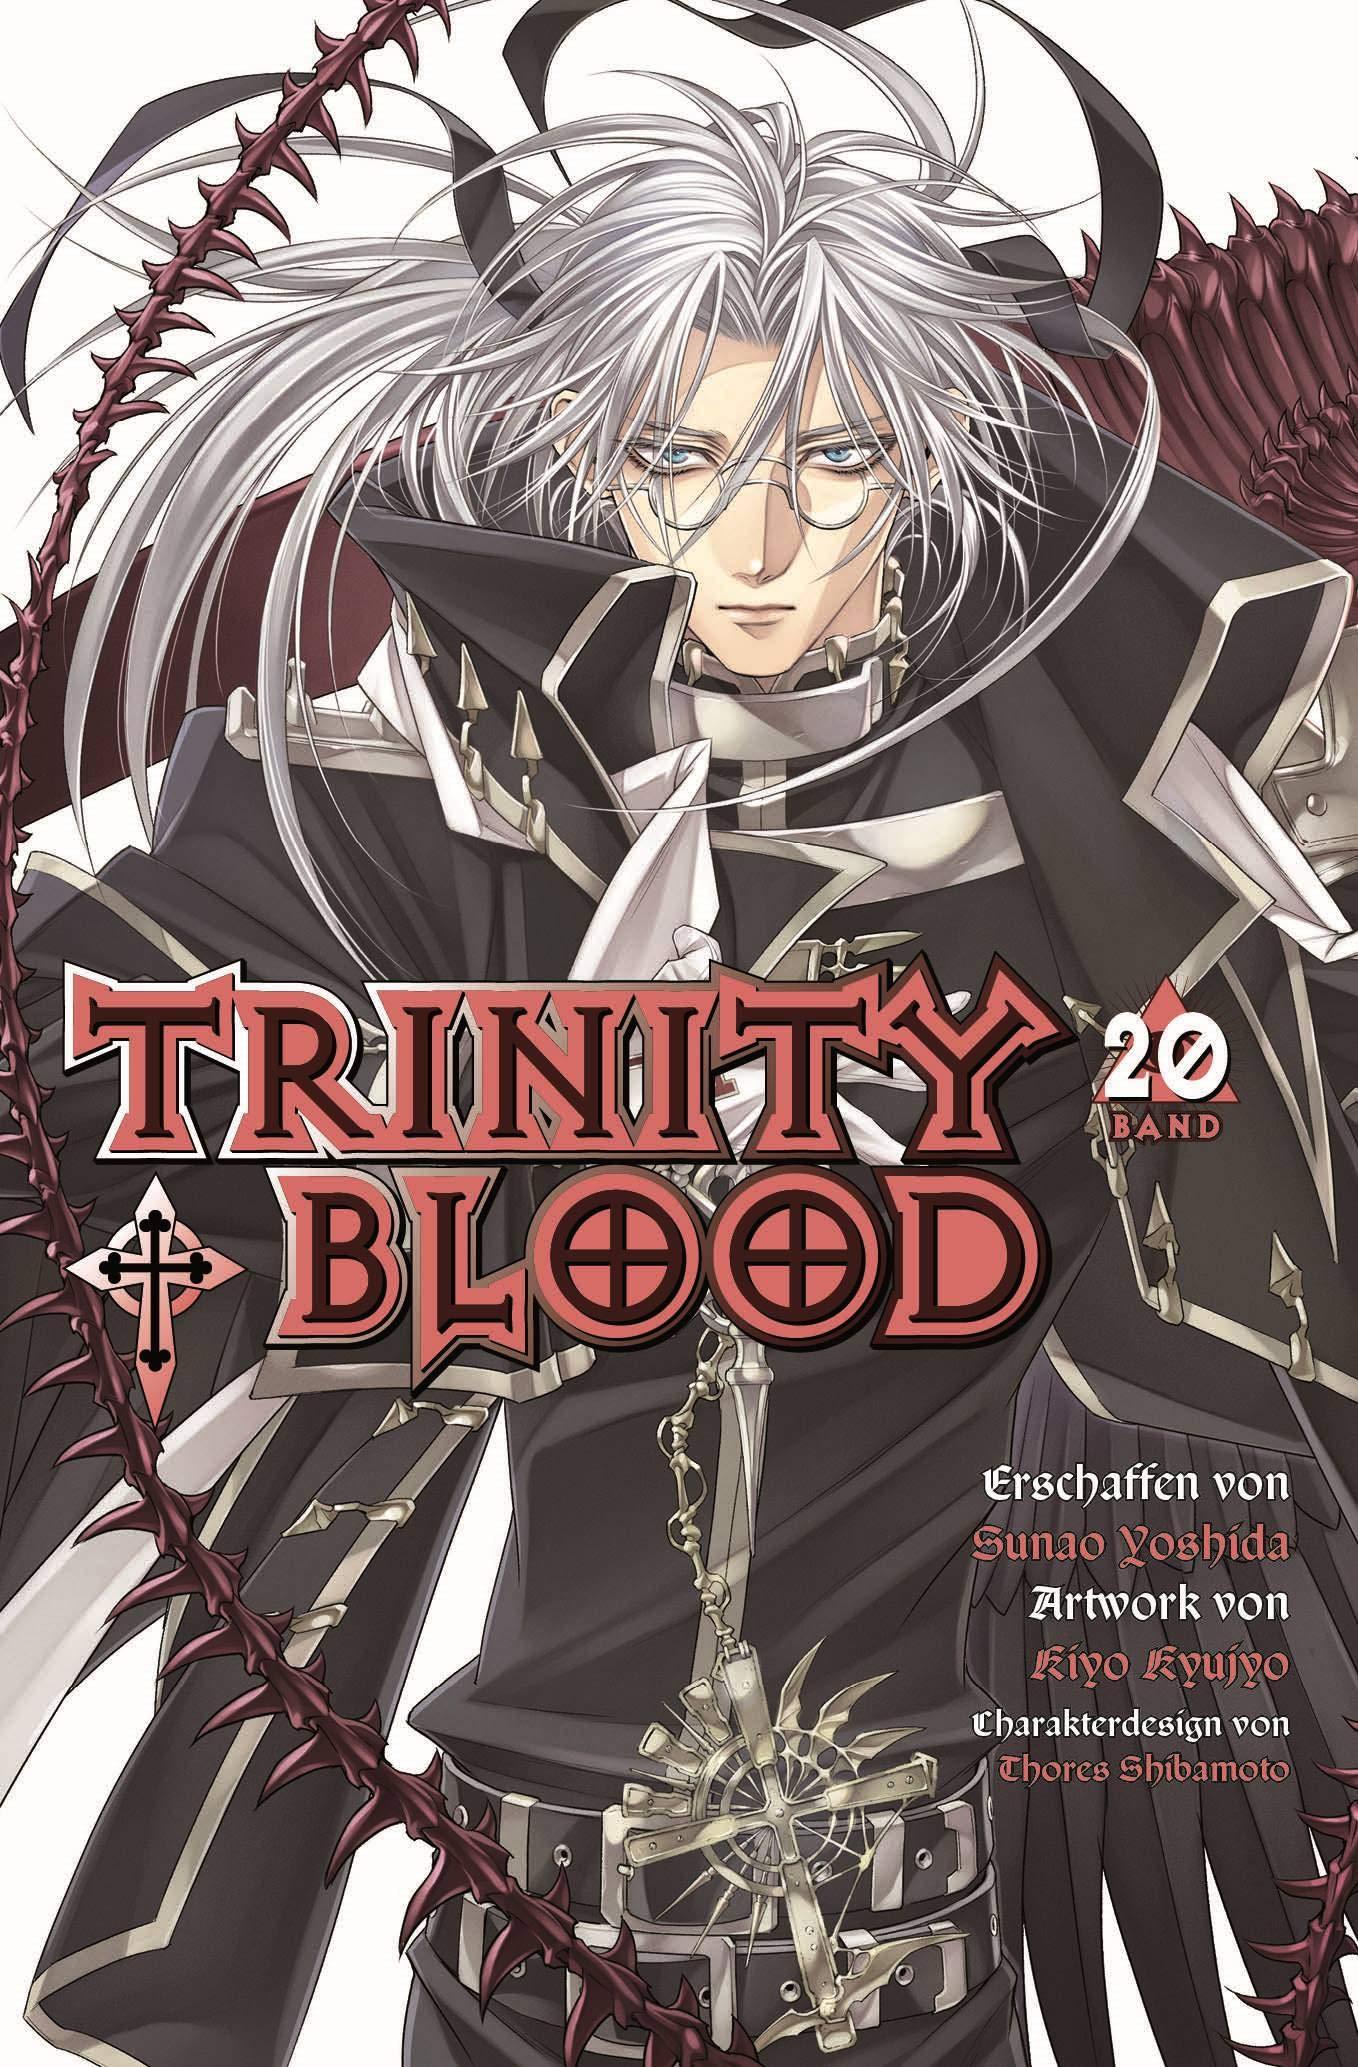 Trinity Blood: Bd. 20: Yoshida, Sunao, Kyujyo, Kiyo: 9783741608827: Amazon.com: Books